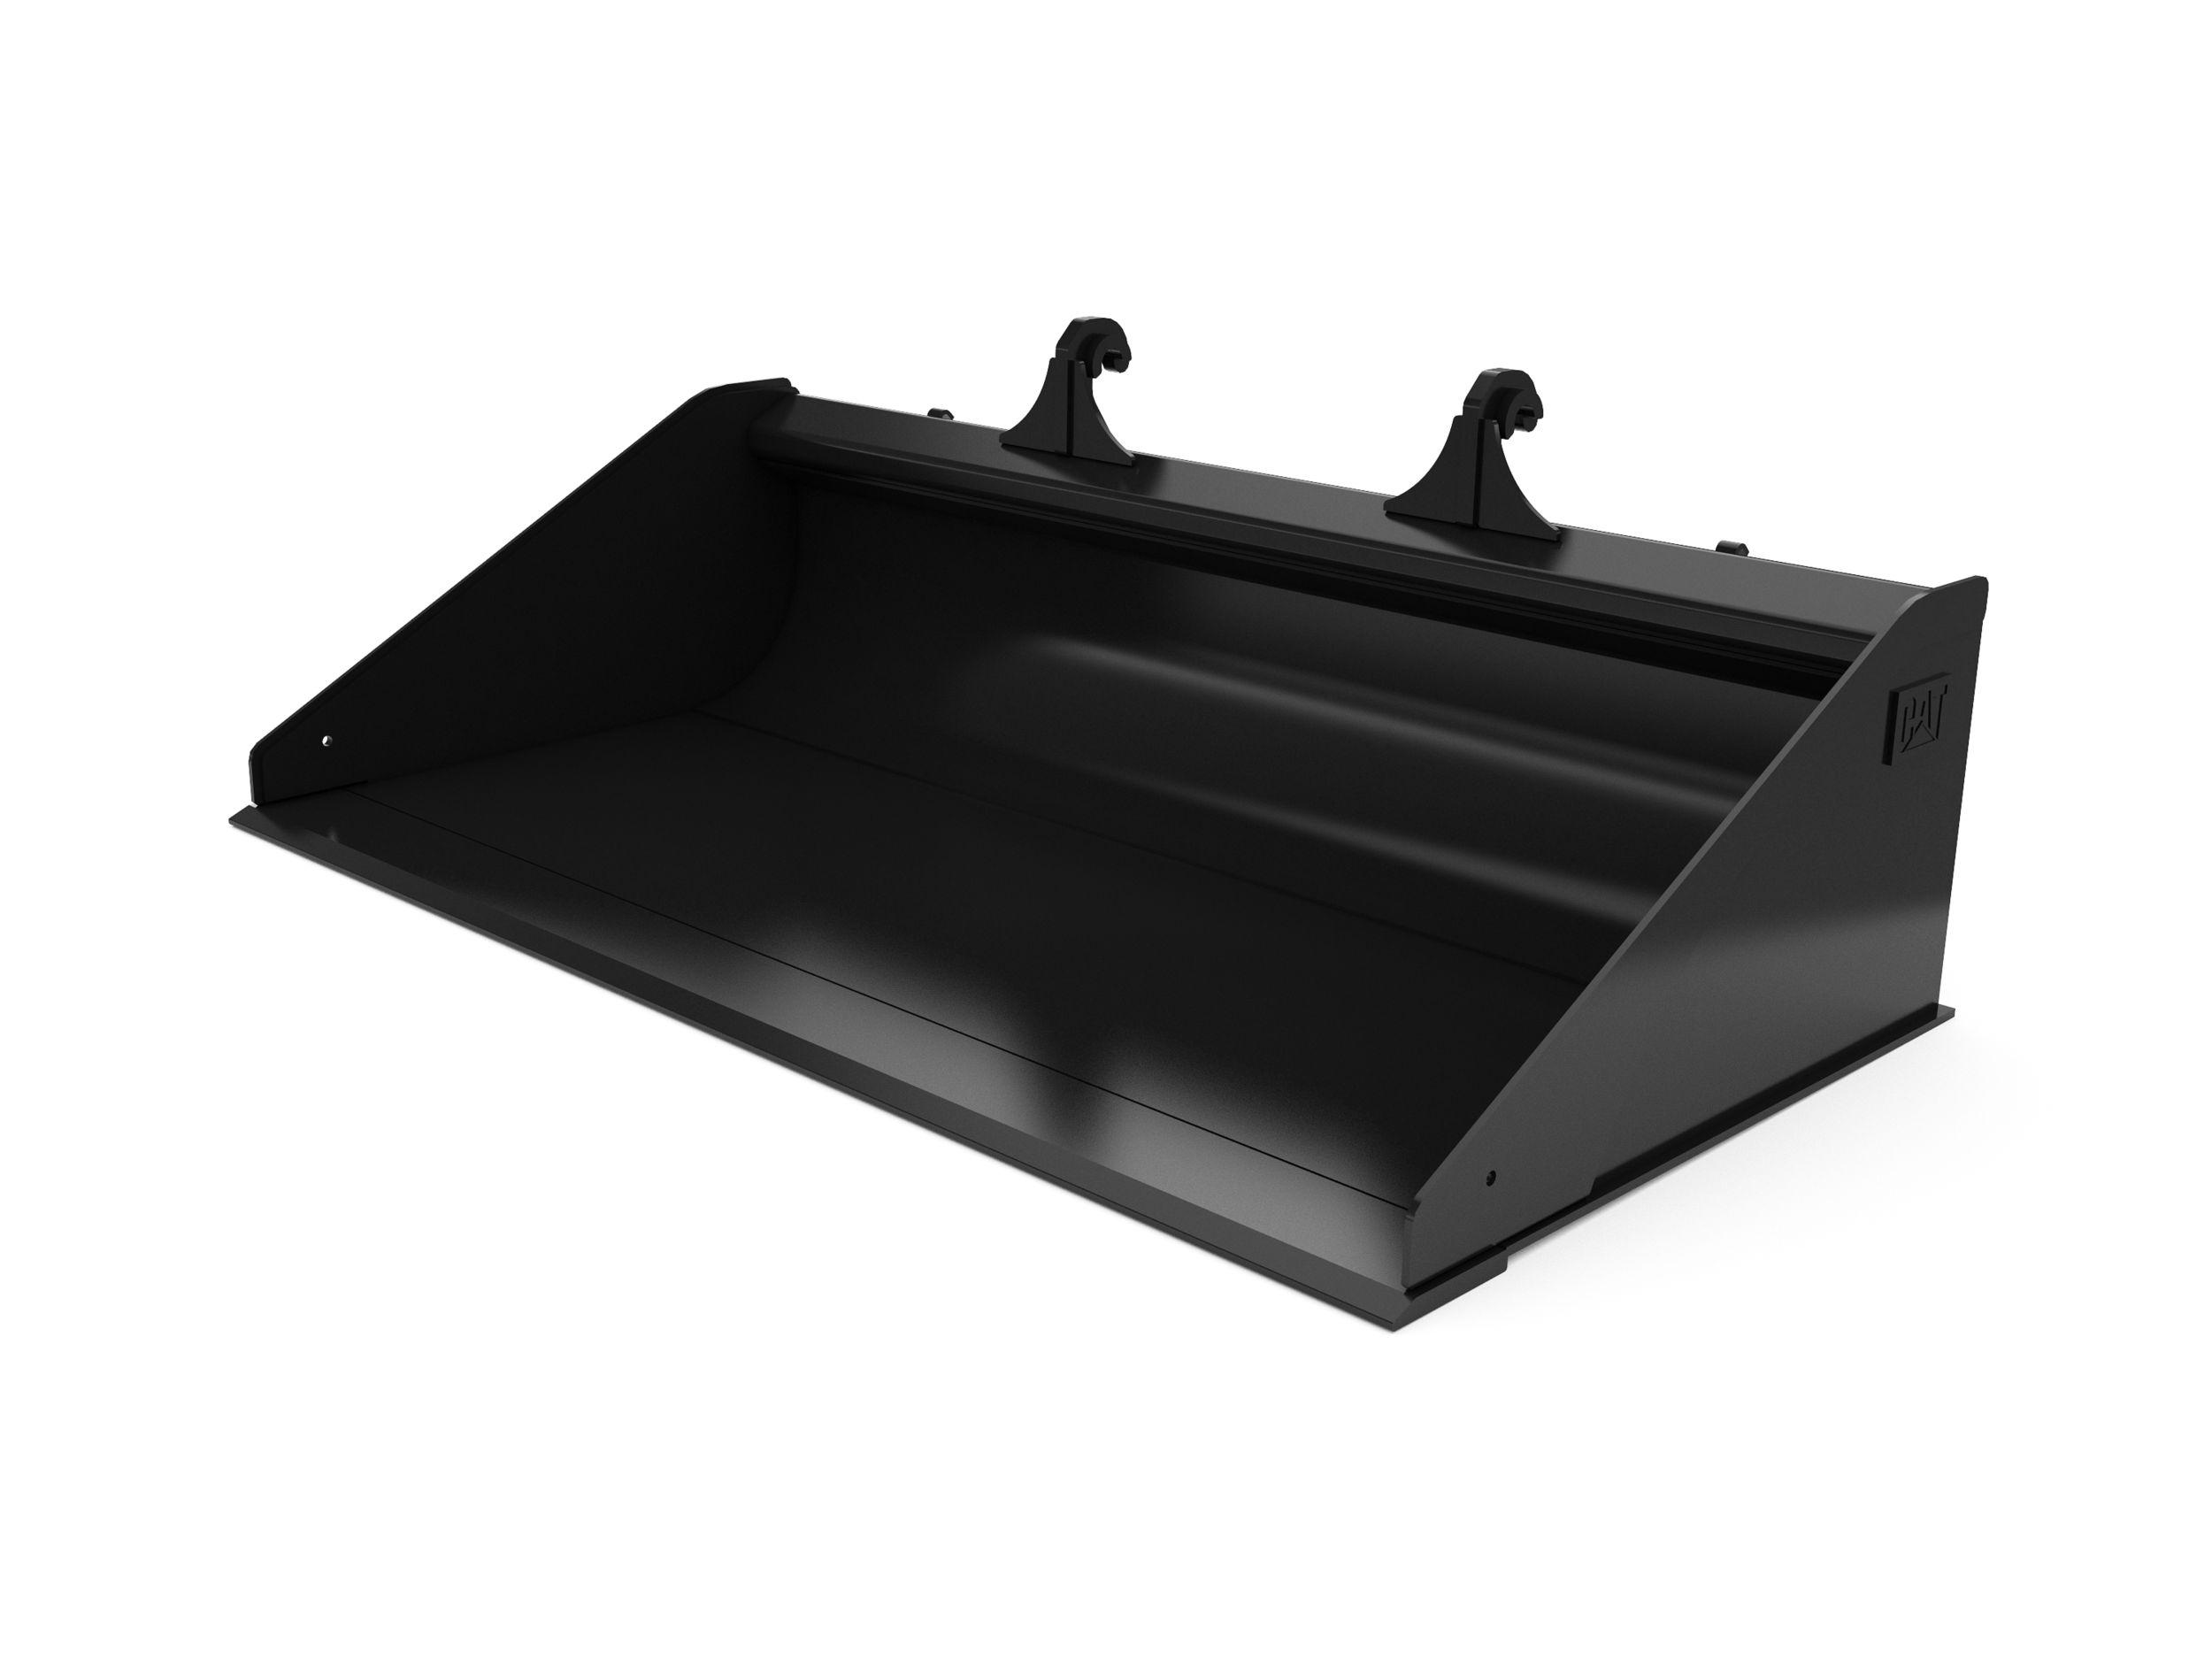 2.0 m3 (2.6 yd3) ISO Coupler Grading Bucket